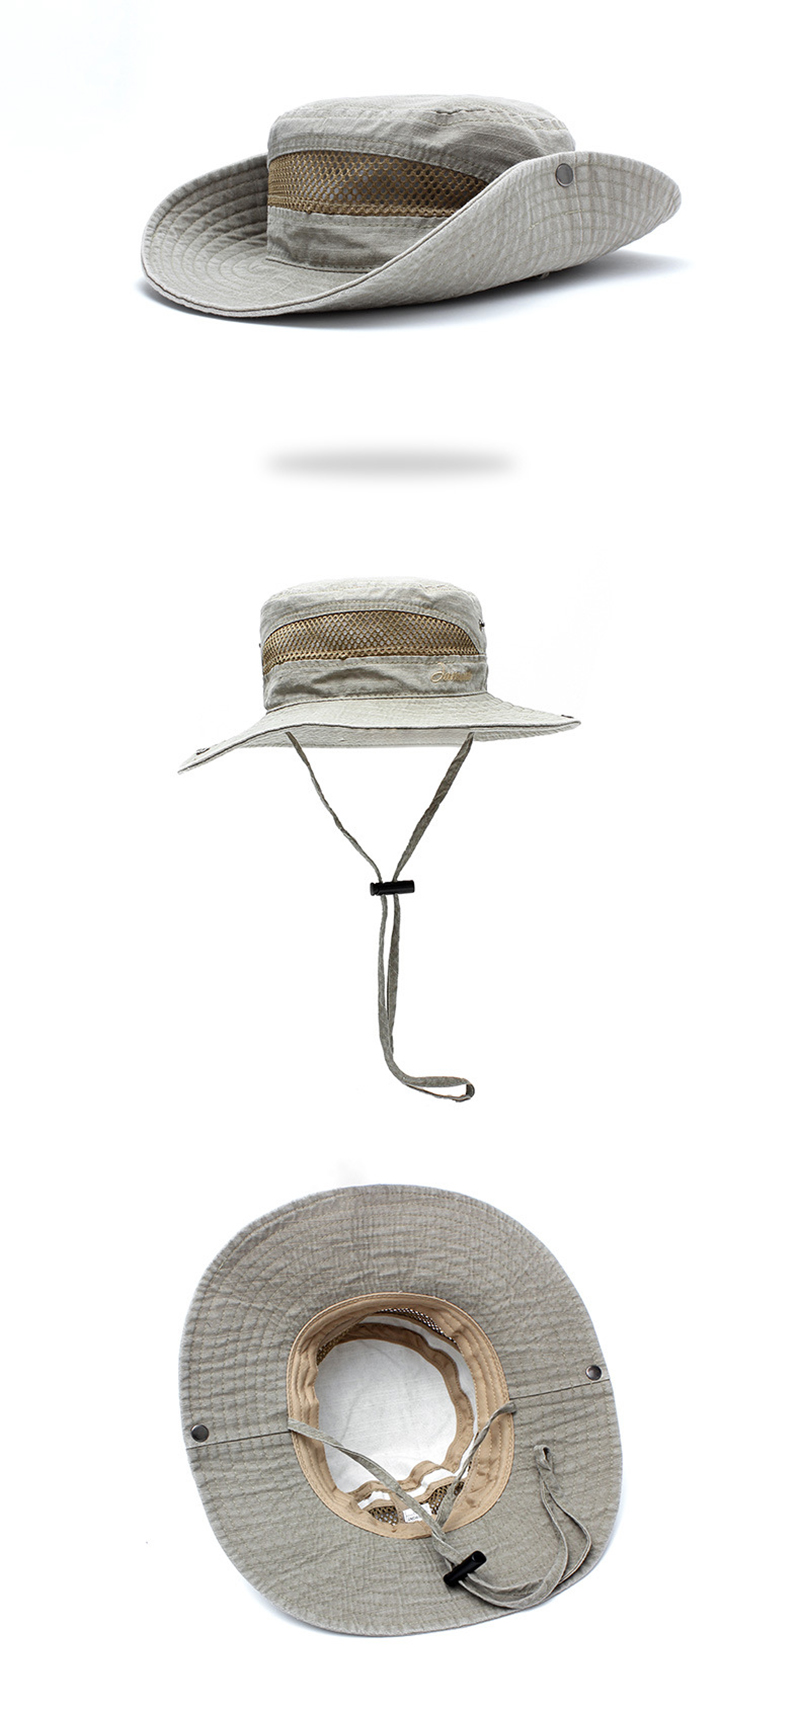 TACVASEN Men Tactical Sniper Hats Sun Boonie Hat Summer Sun-proof Military Cap Men's Cotton Safari Army Fish Hike Hats Foldable